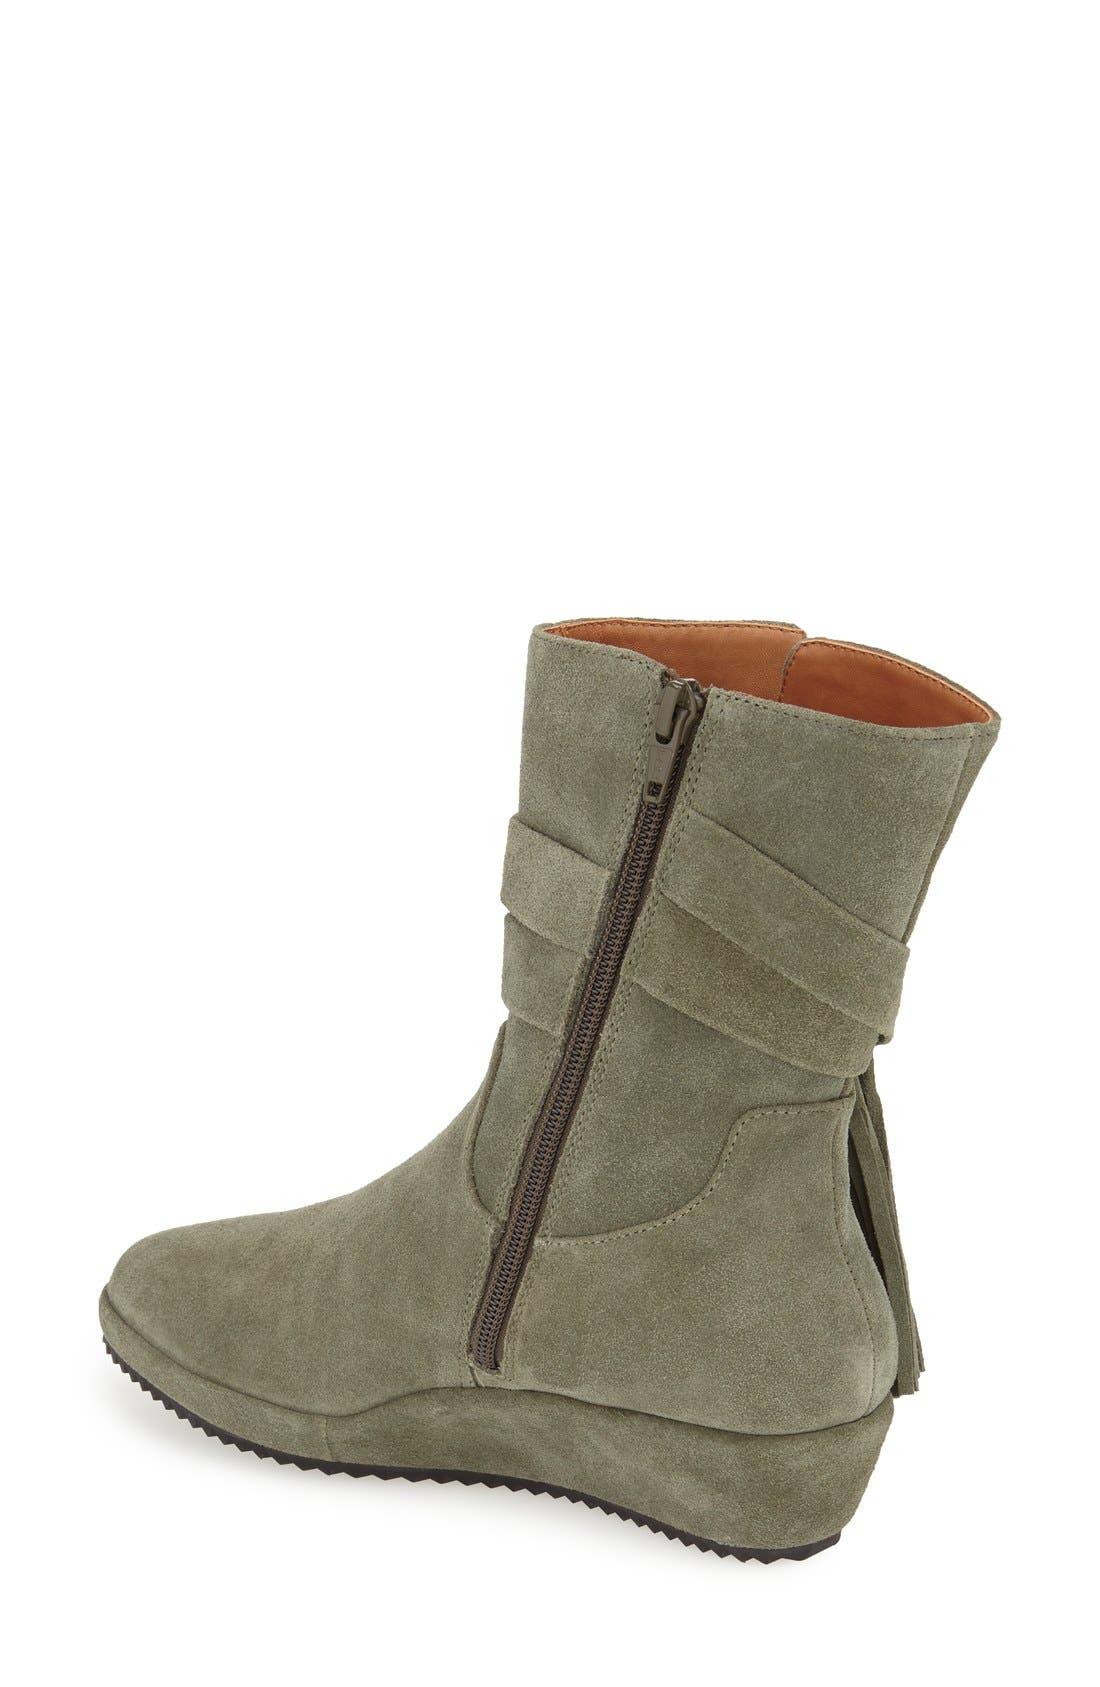 Alternate Image 2  - L'Amour des Pieds 'Bernyce' Boot (Women)